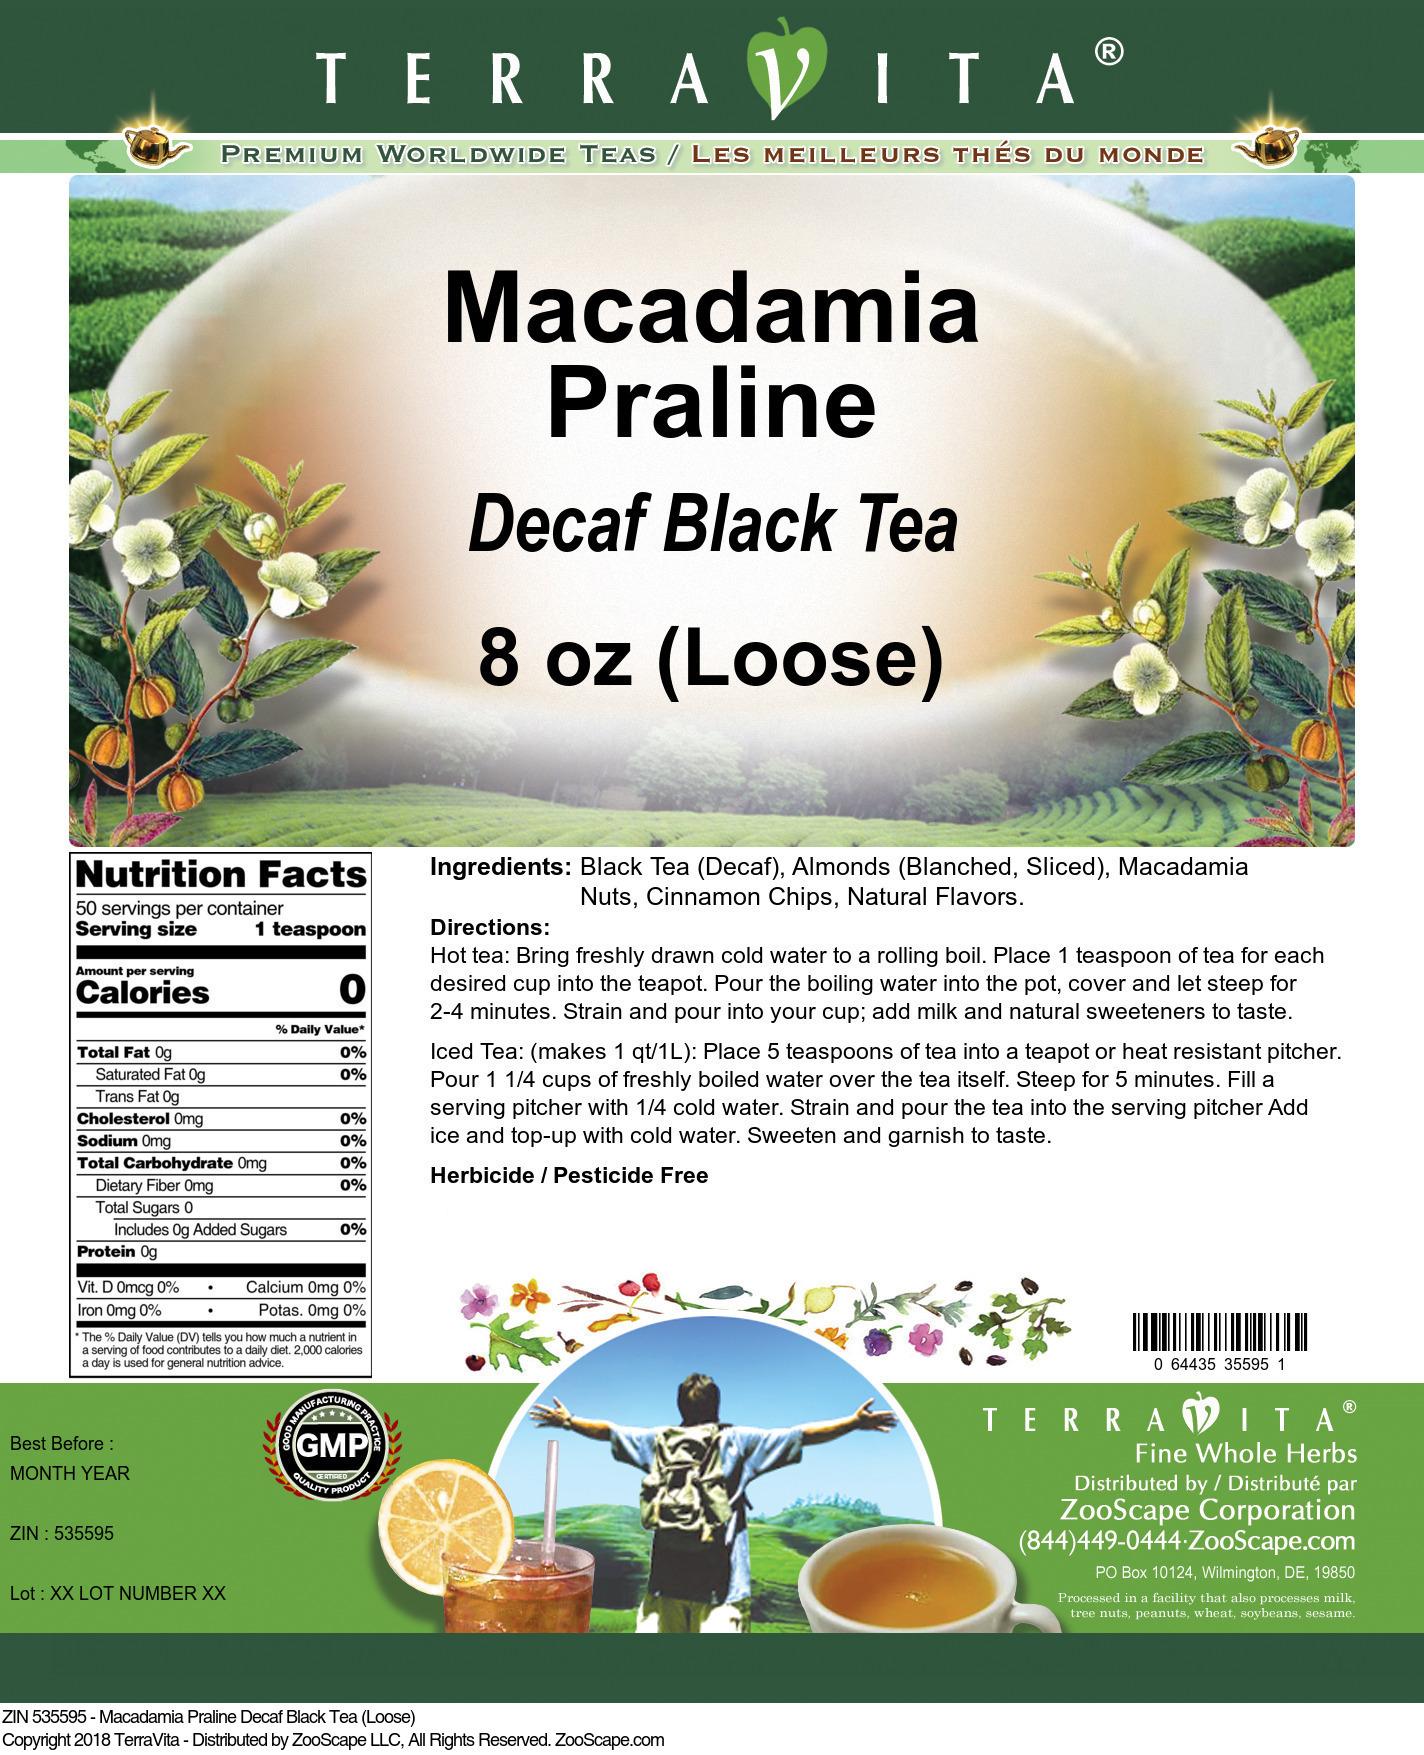 Macadamia Praline Decaf Black Tea